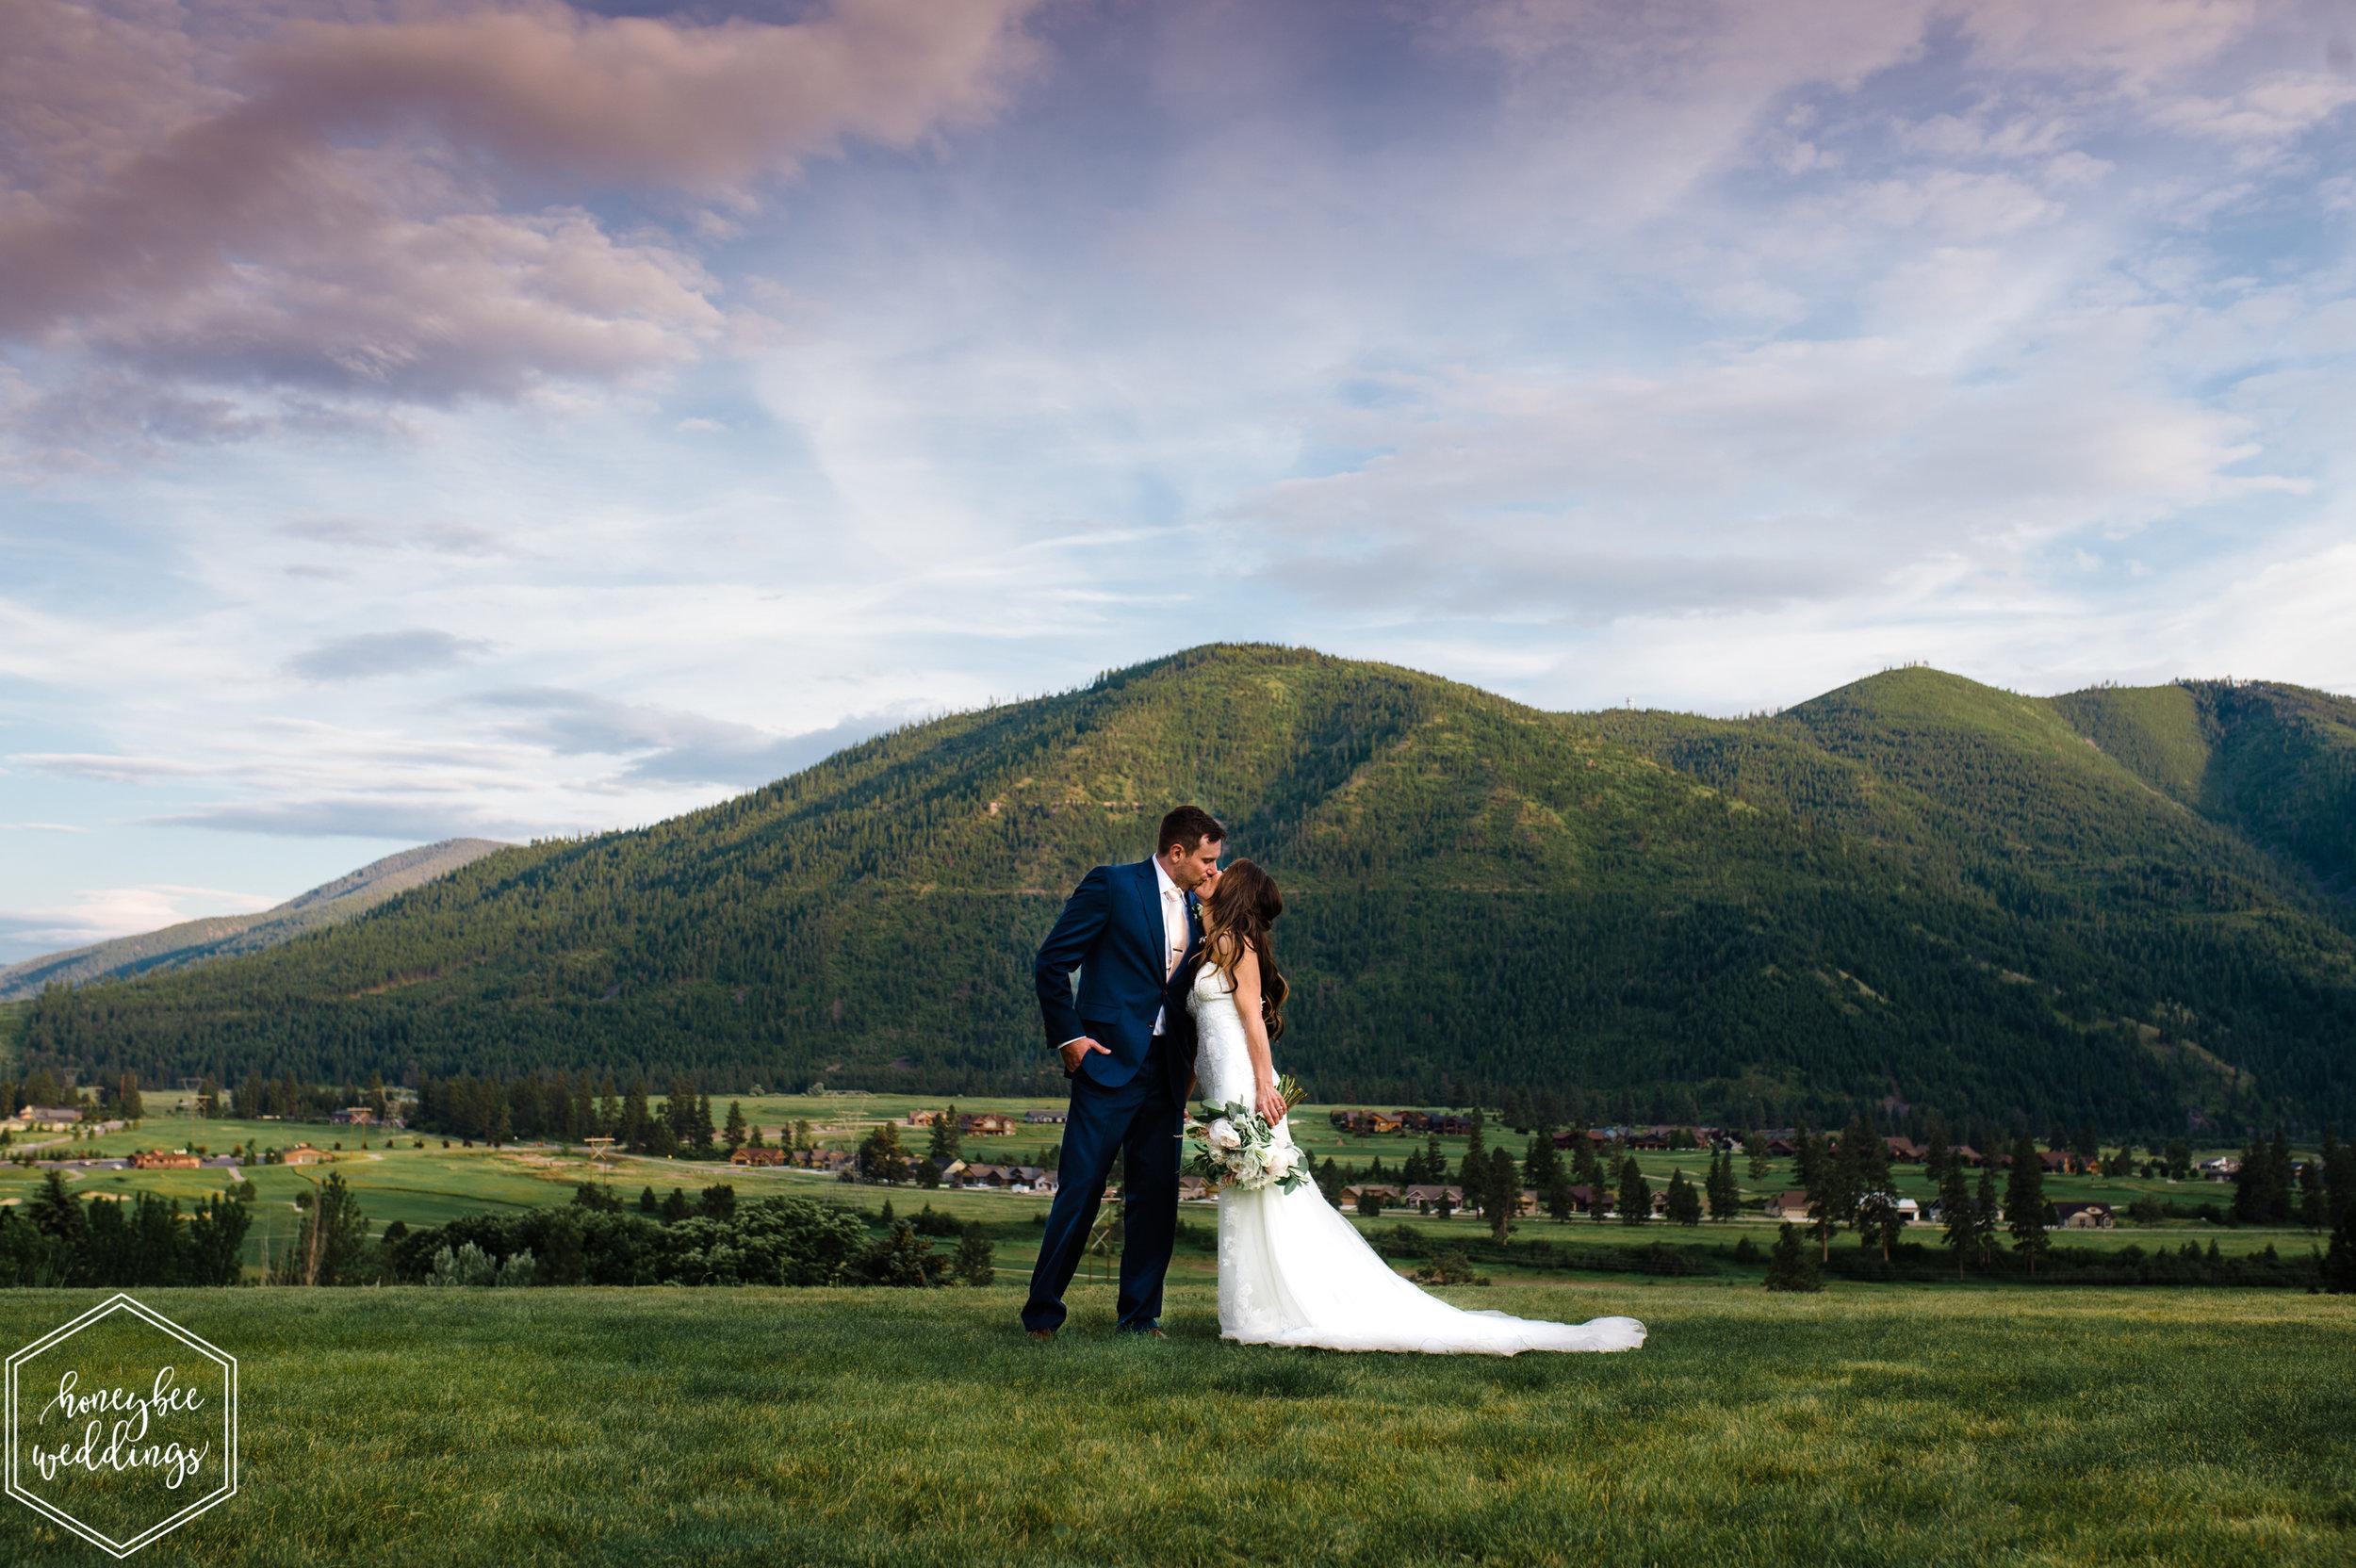 373Montana Wedding Photographer_Missoula Wedding_Honeybee Weddings_Devlin & Jacob_June 22, 2019-2432.jpg